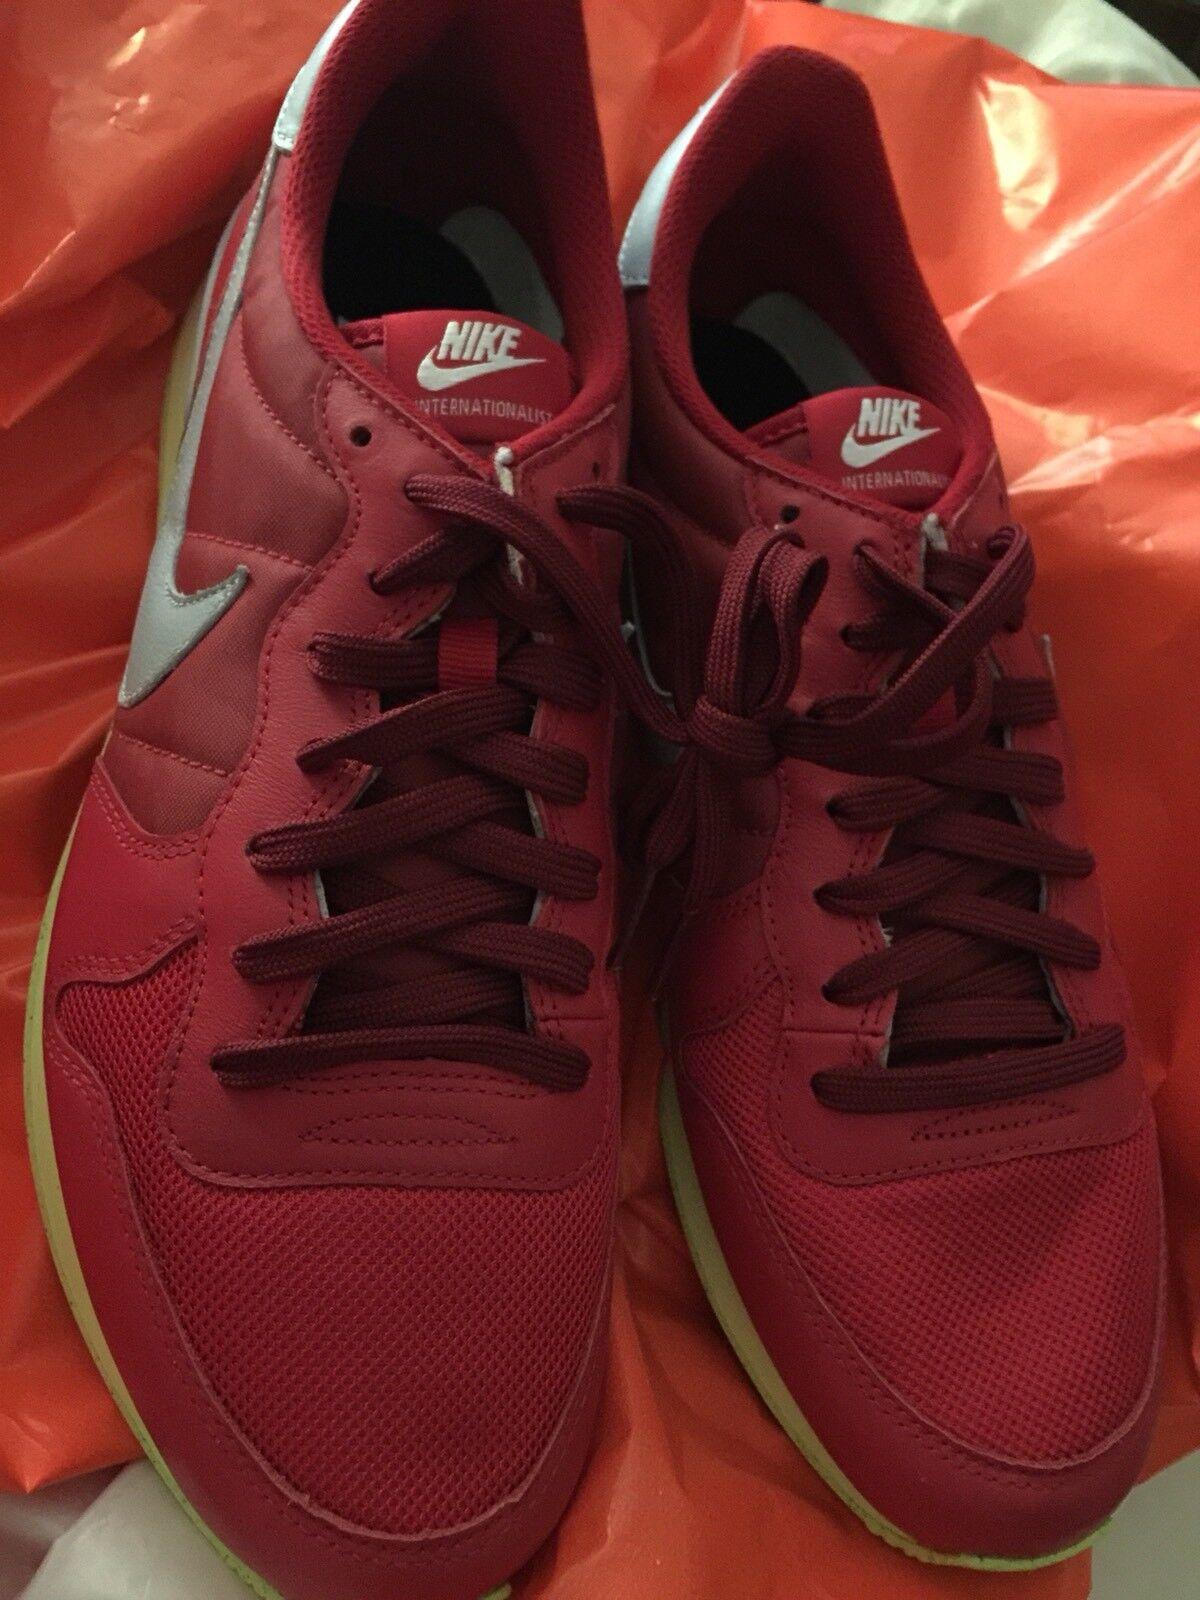 Nike ID Air Vortex  Red size 10.5 Internationalist max  Rare